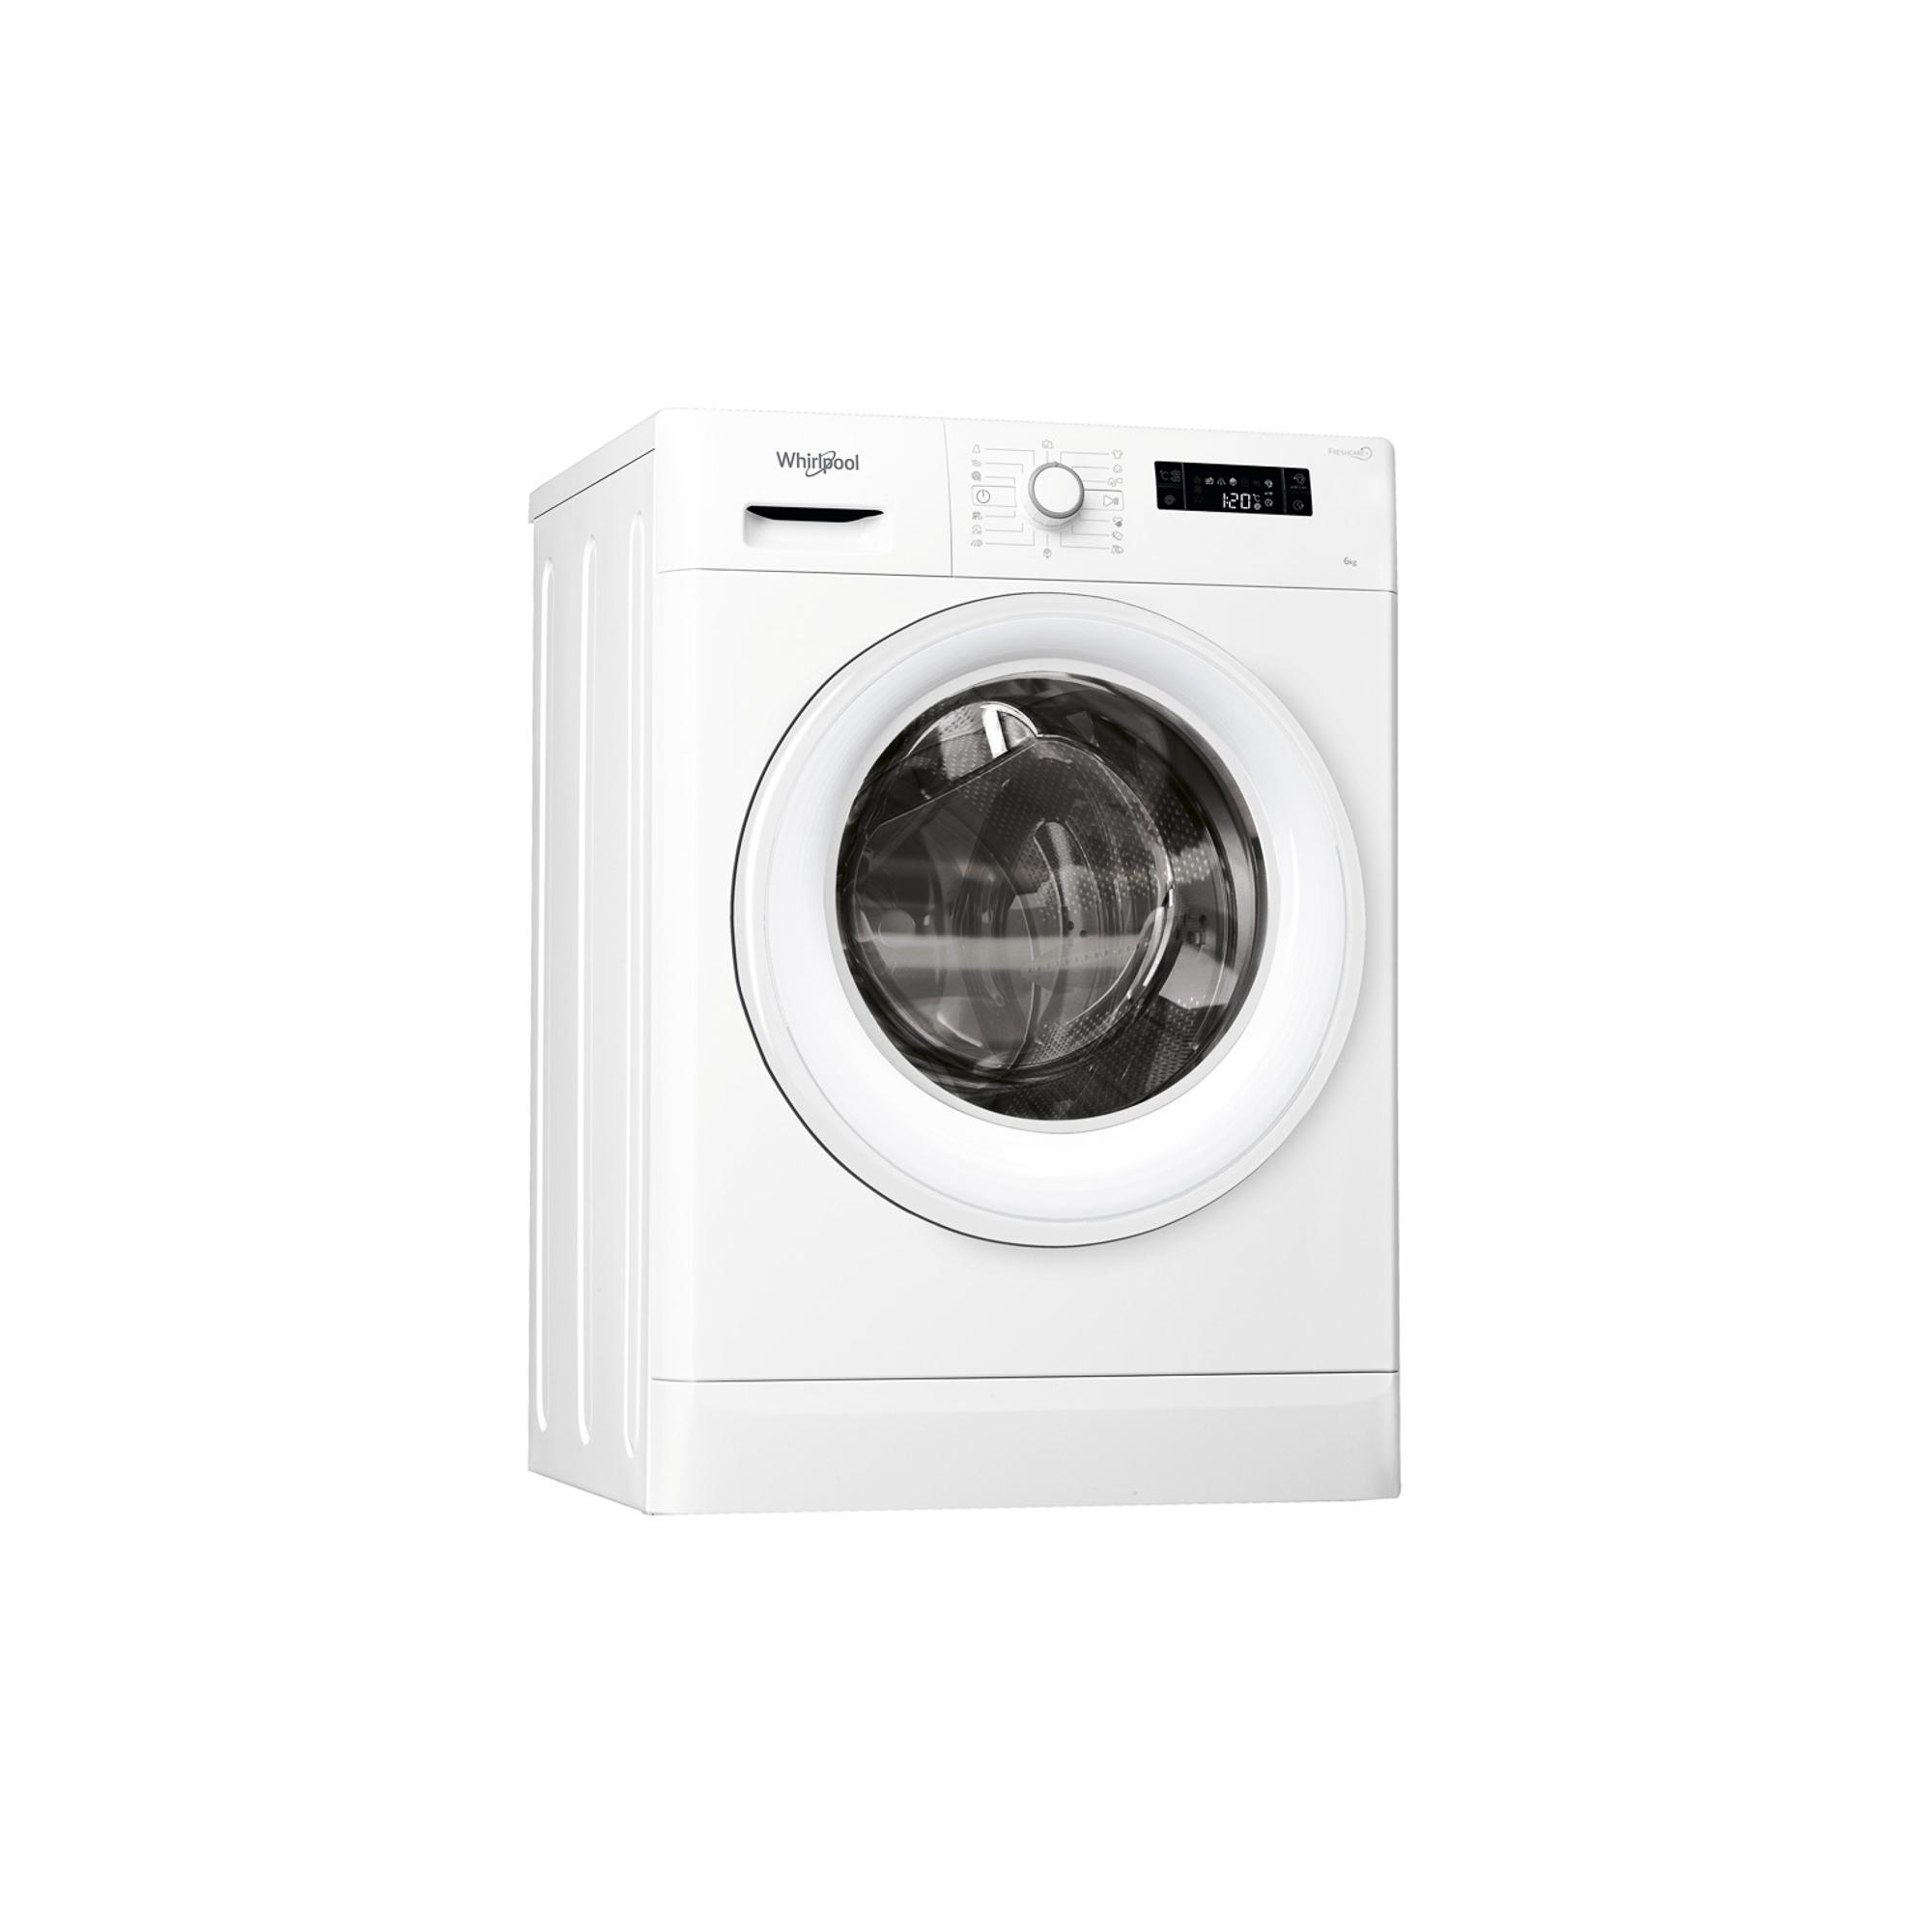 Фото - Стиральная машина Whirlpool FWSF 61052 White стиральная машина whirlpool fwsg 61283 wc